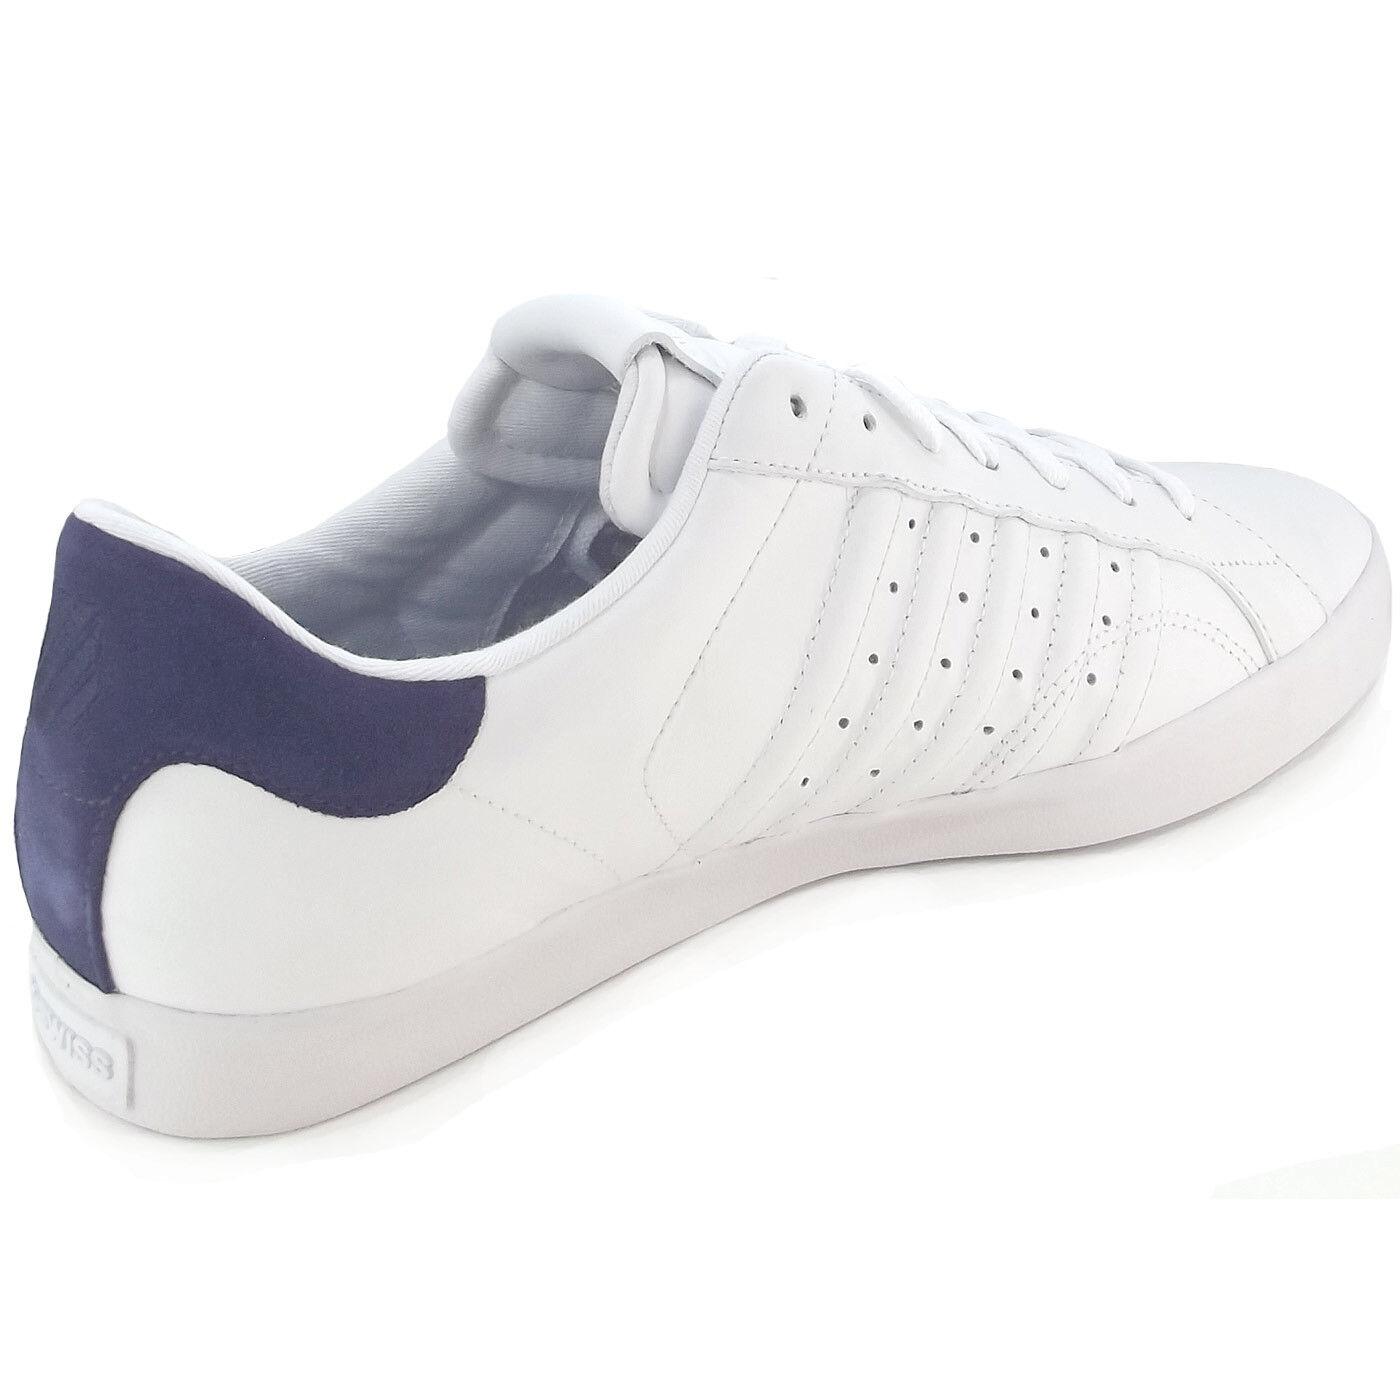 K-Swiss Belmont Herren Herren Belmont Sneaker weiß/navy (white/navy) 44677a